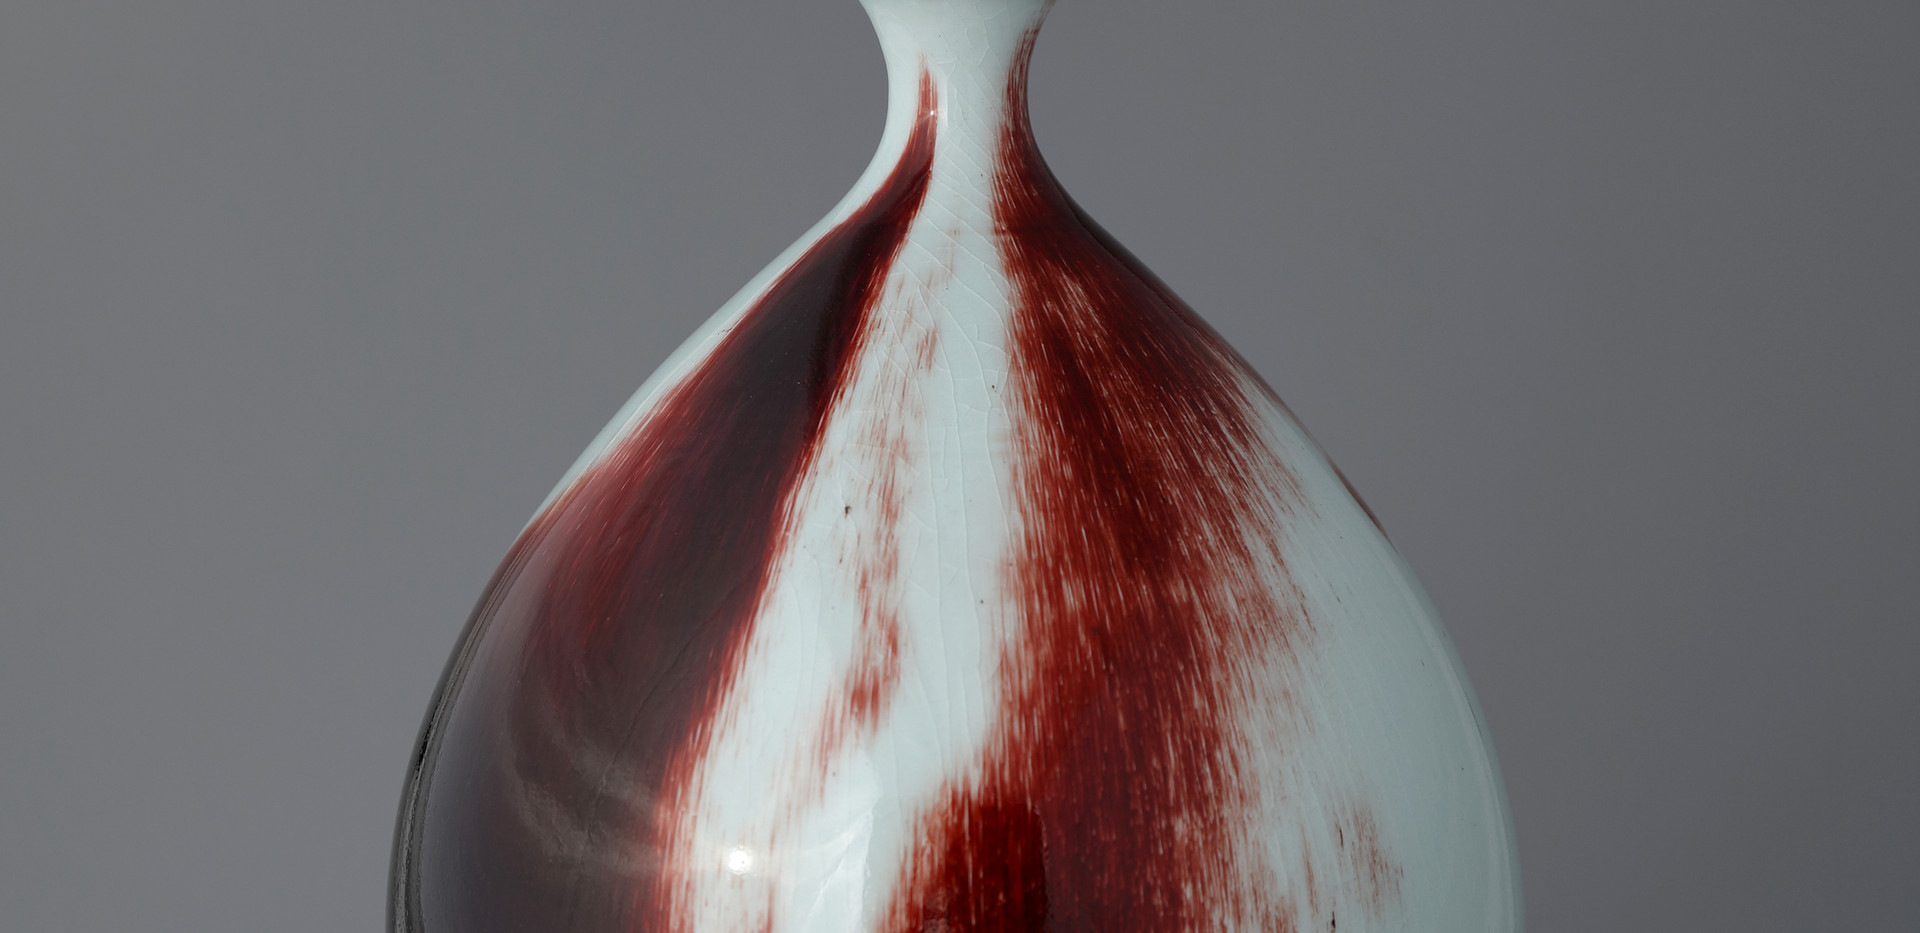 White Porcelain Bottle in Underglaze Copper-Red, 2020